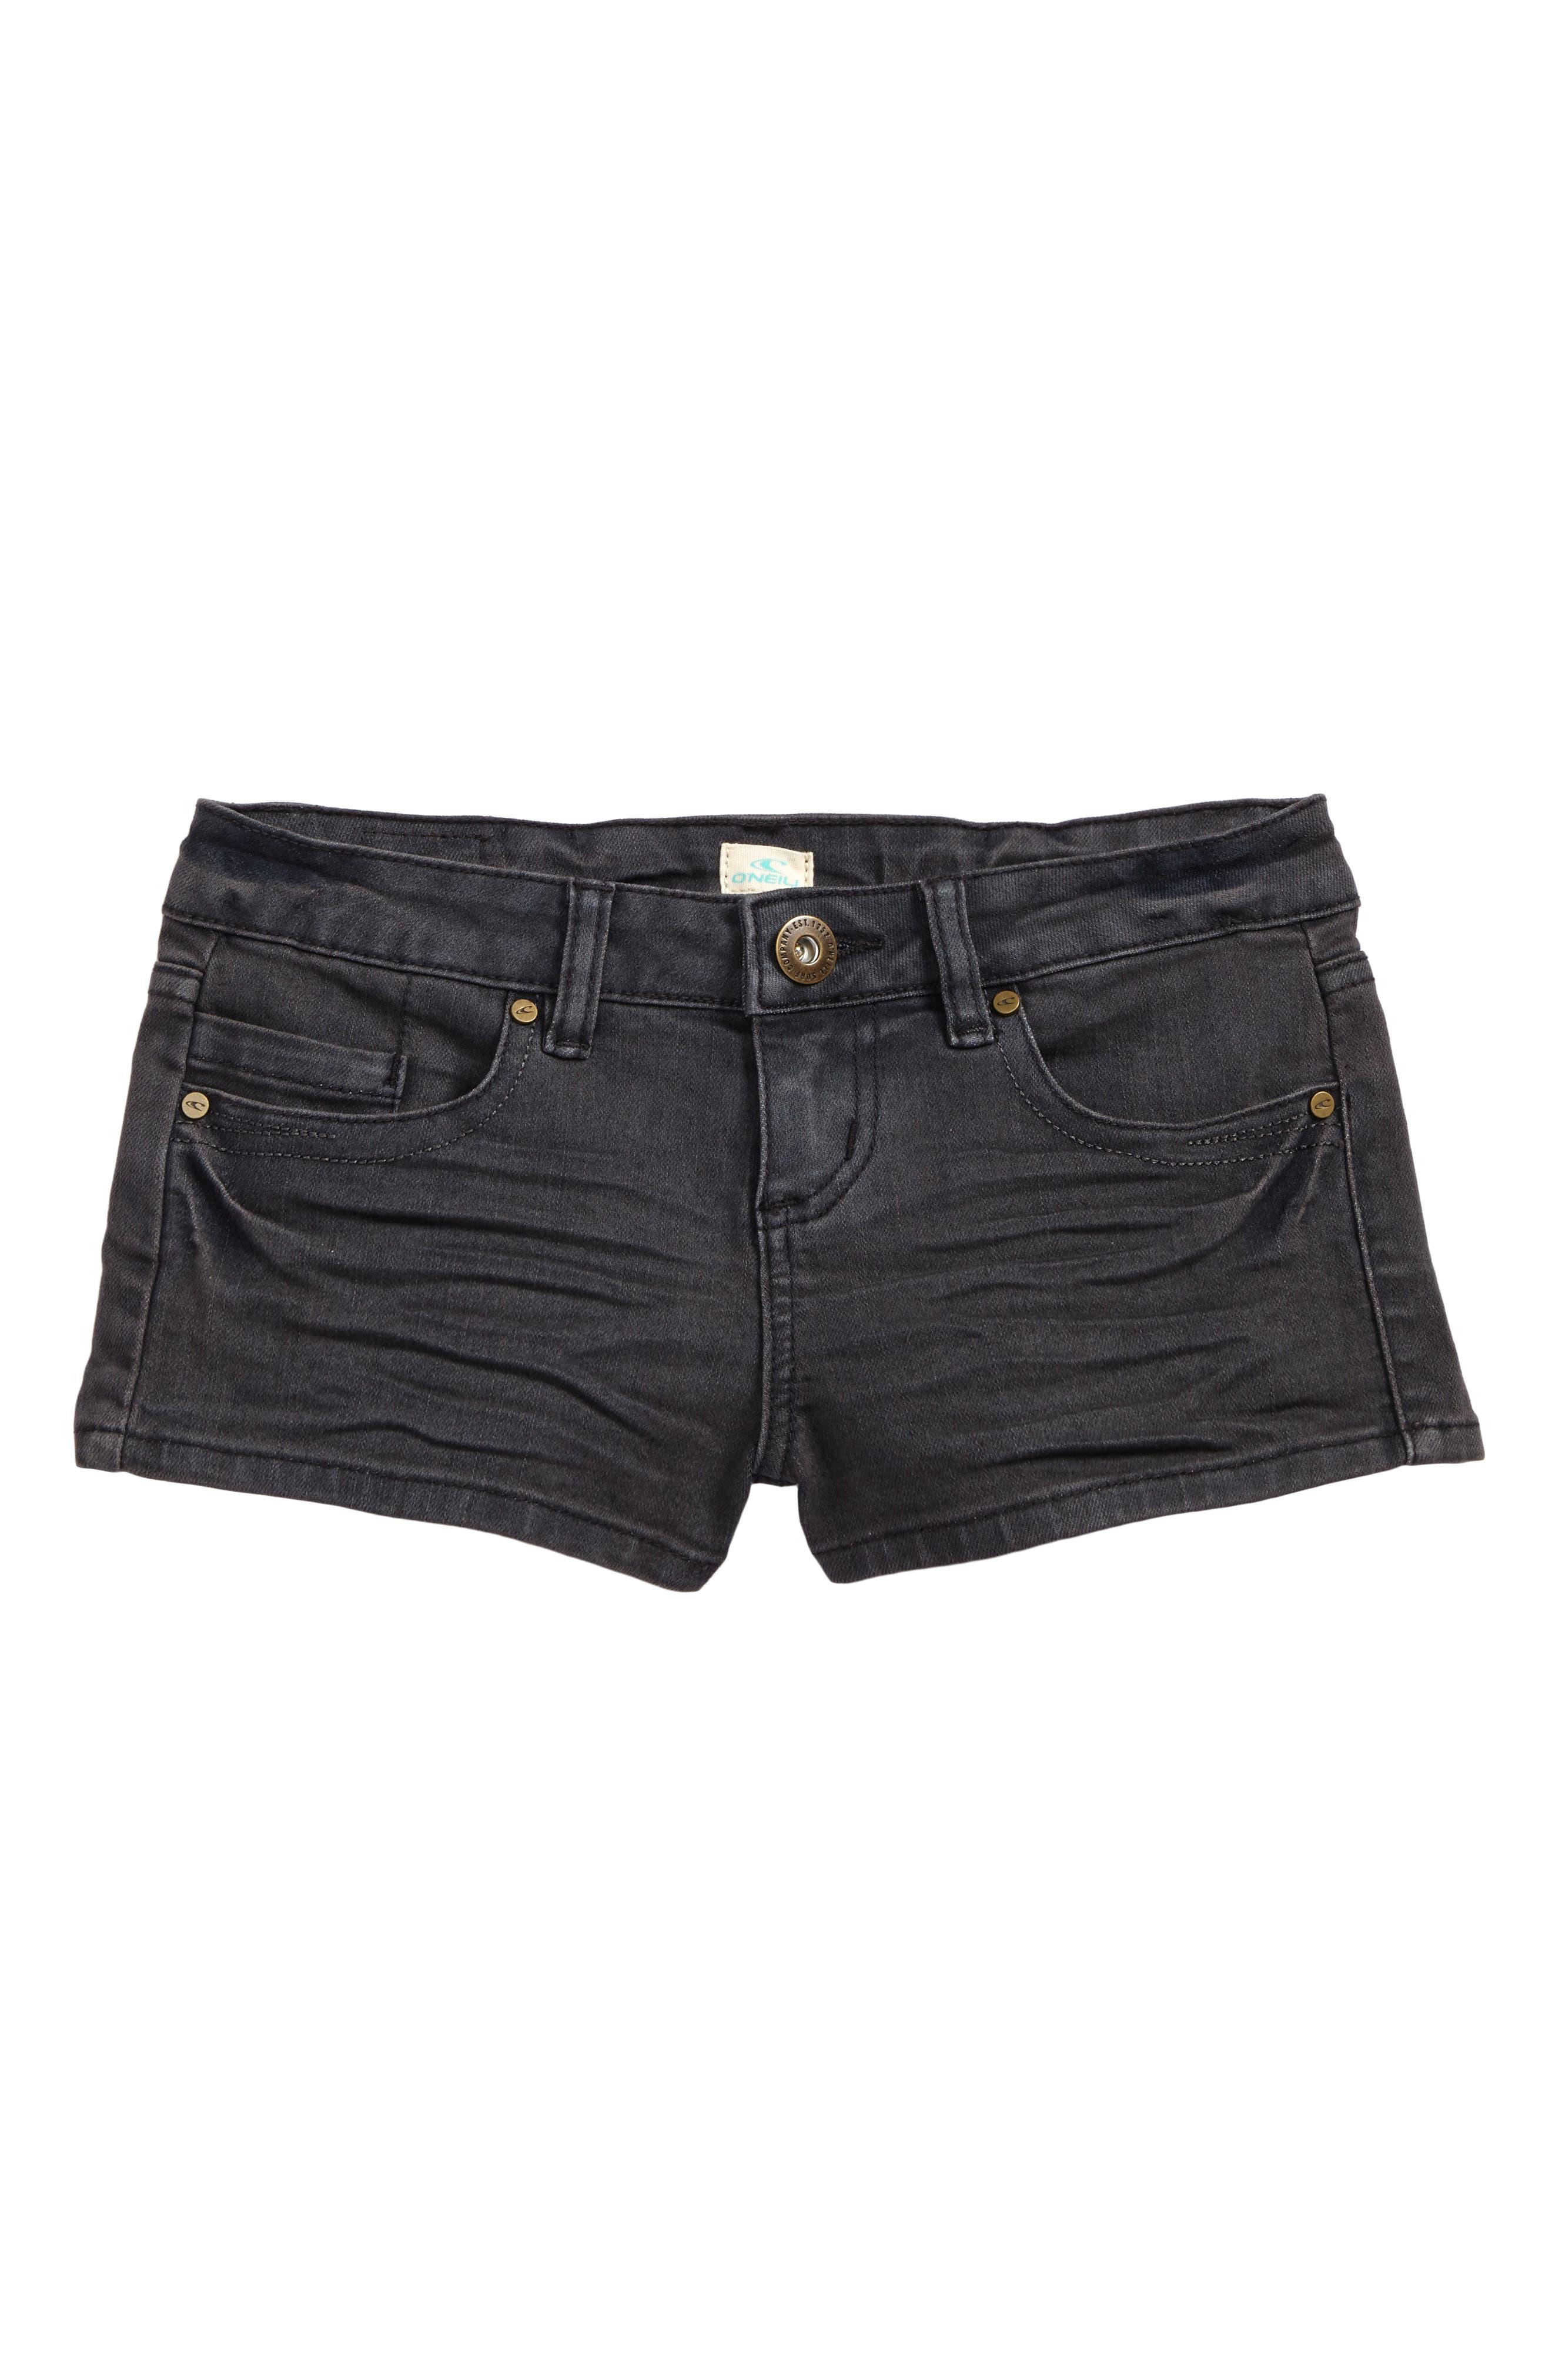 O'Neiil Waidley Denim Shorts,                         Main,                         color, Slate Wash - Slt